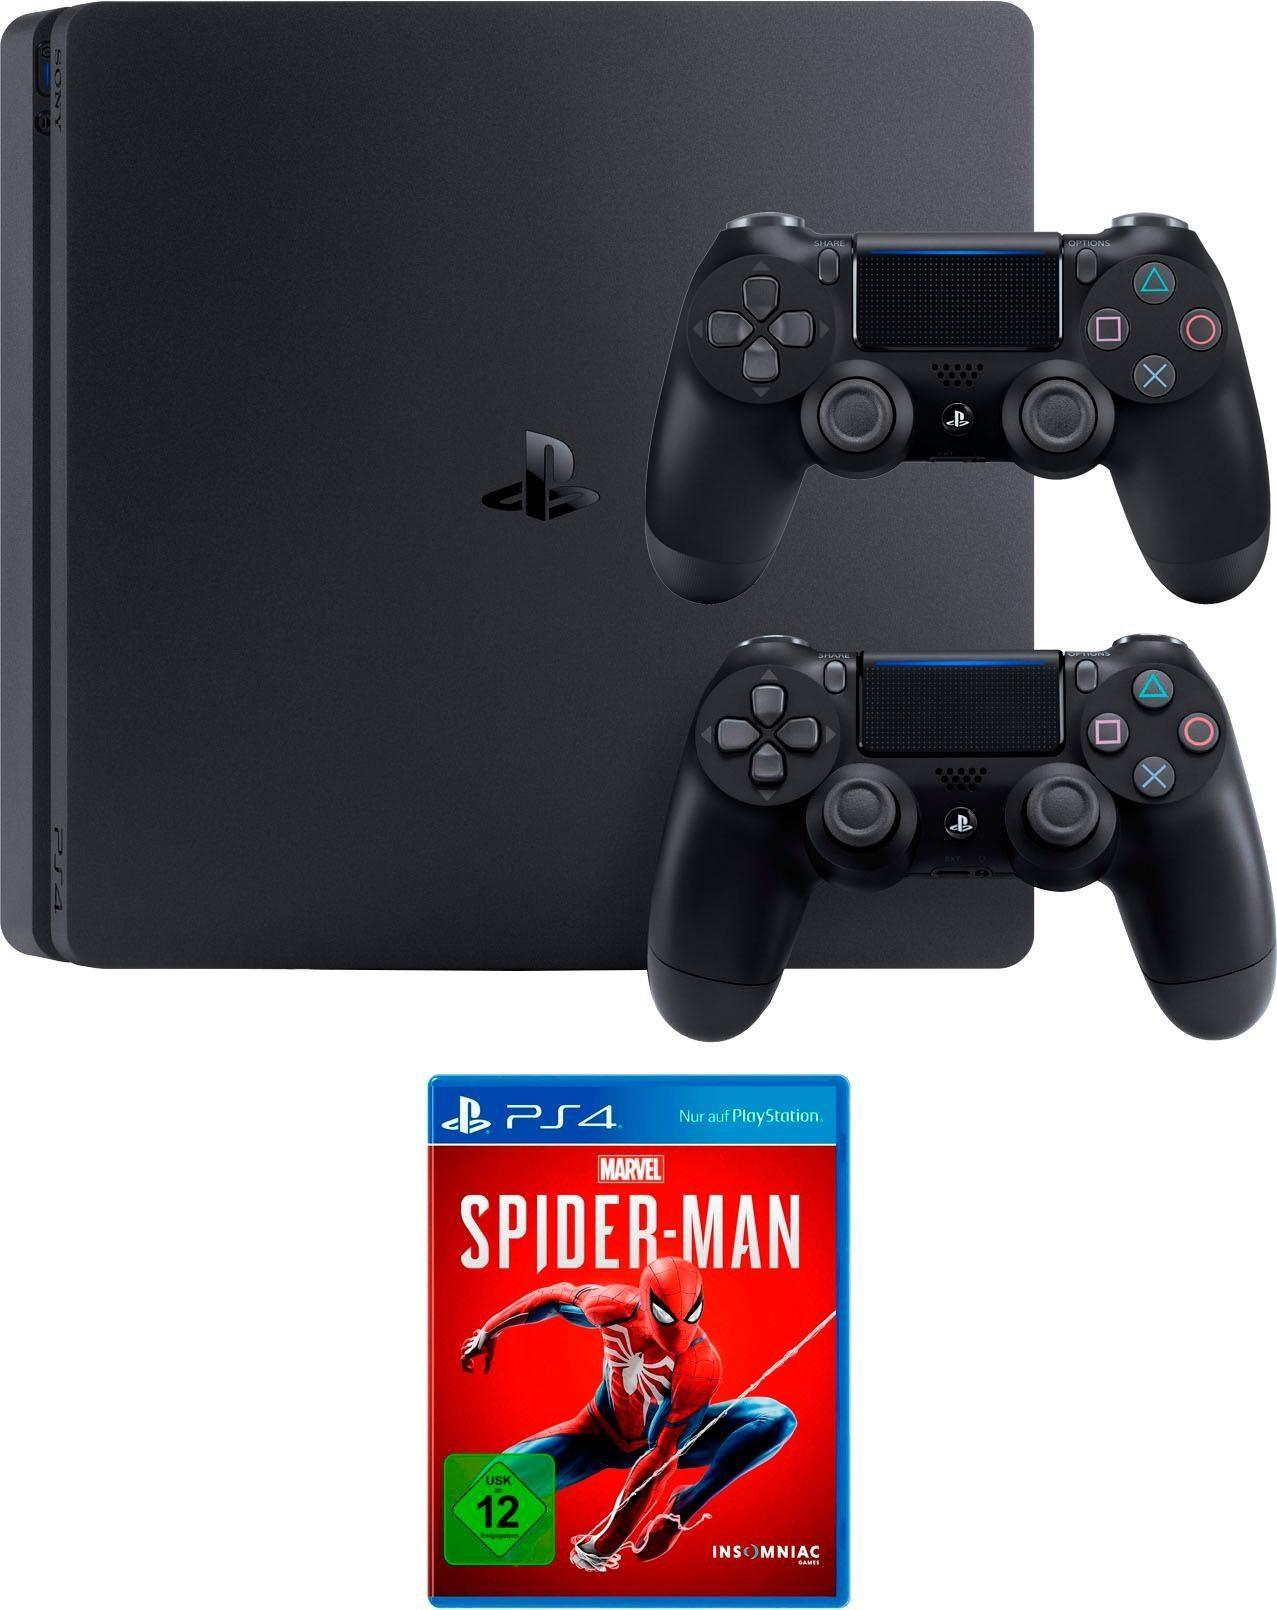 PlayStation 4 Slim (PS4 Slim) 1TB, inkl. Spider-Man und 2. Controller